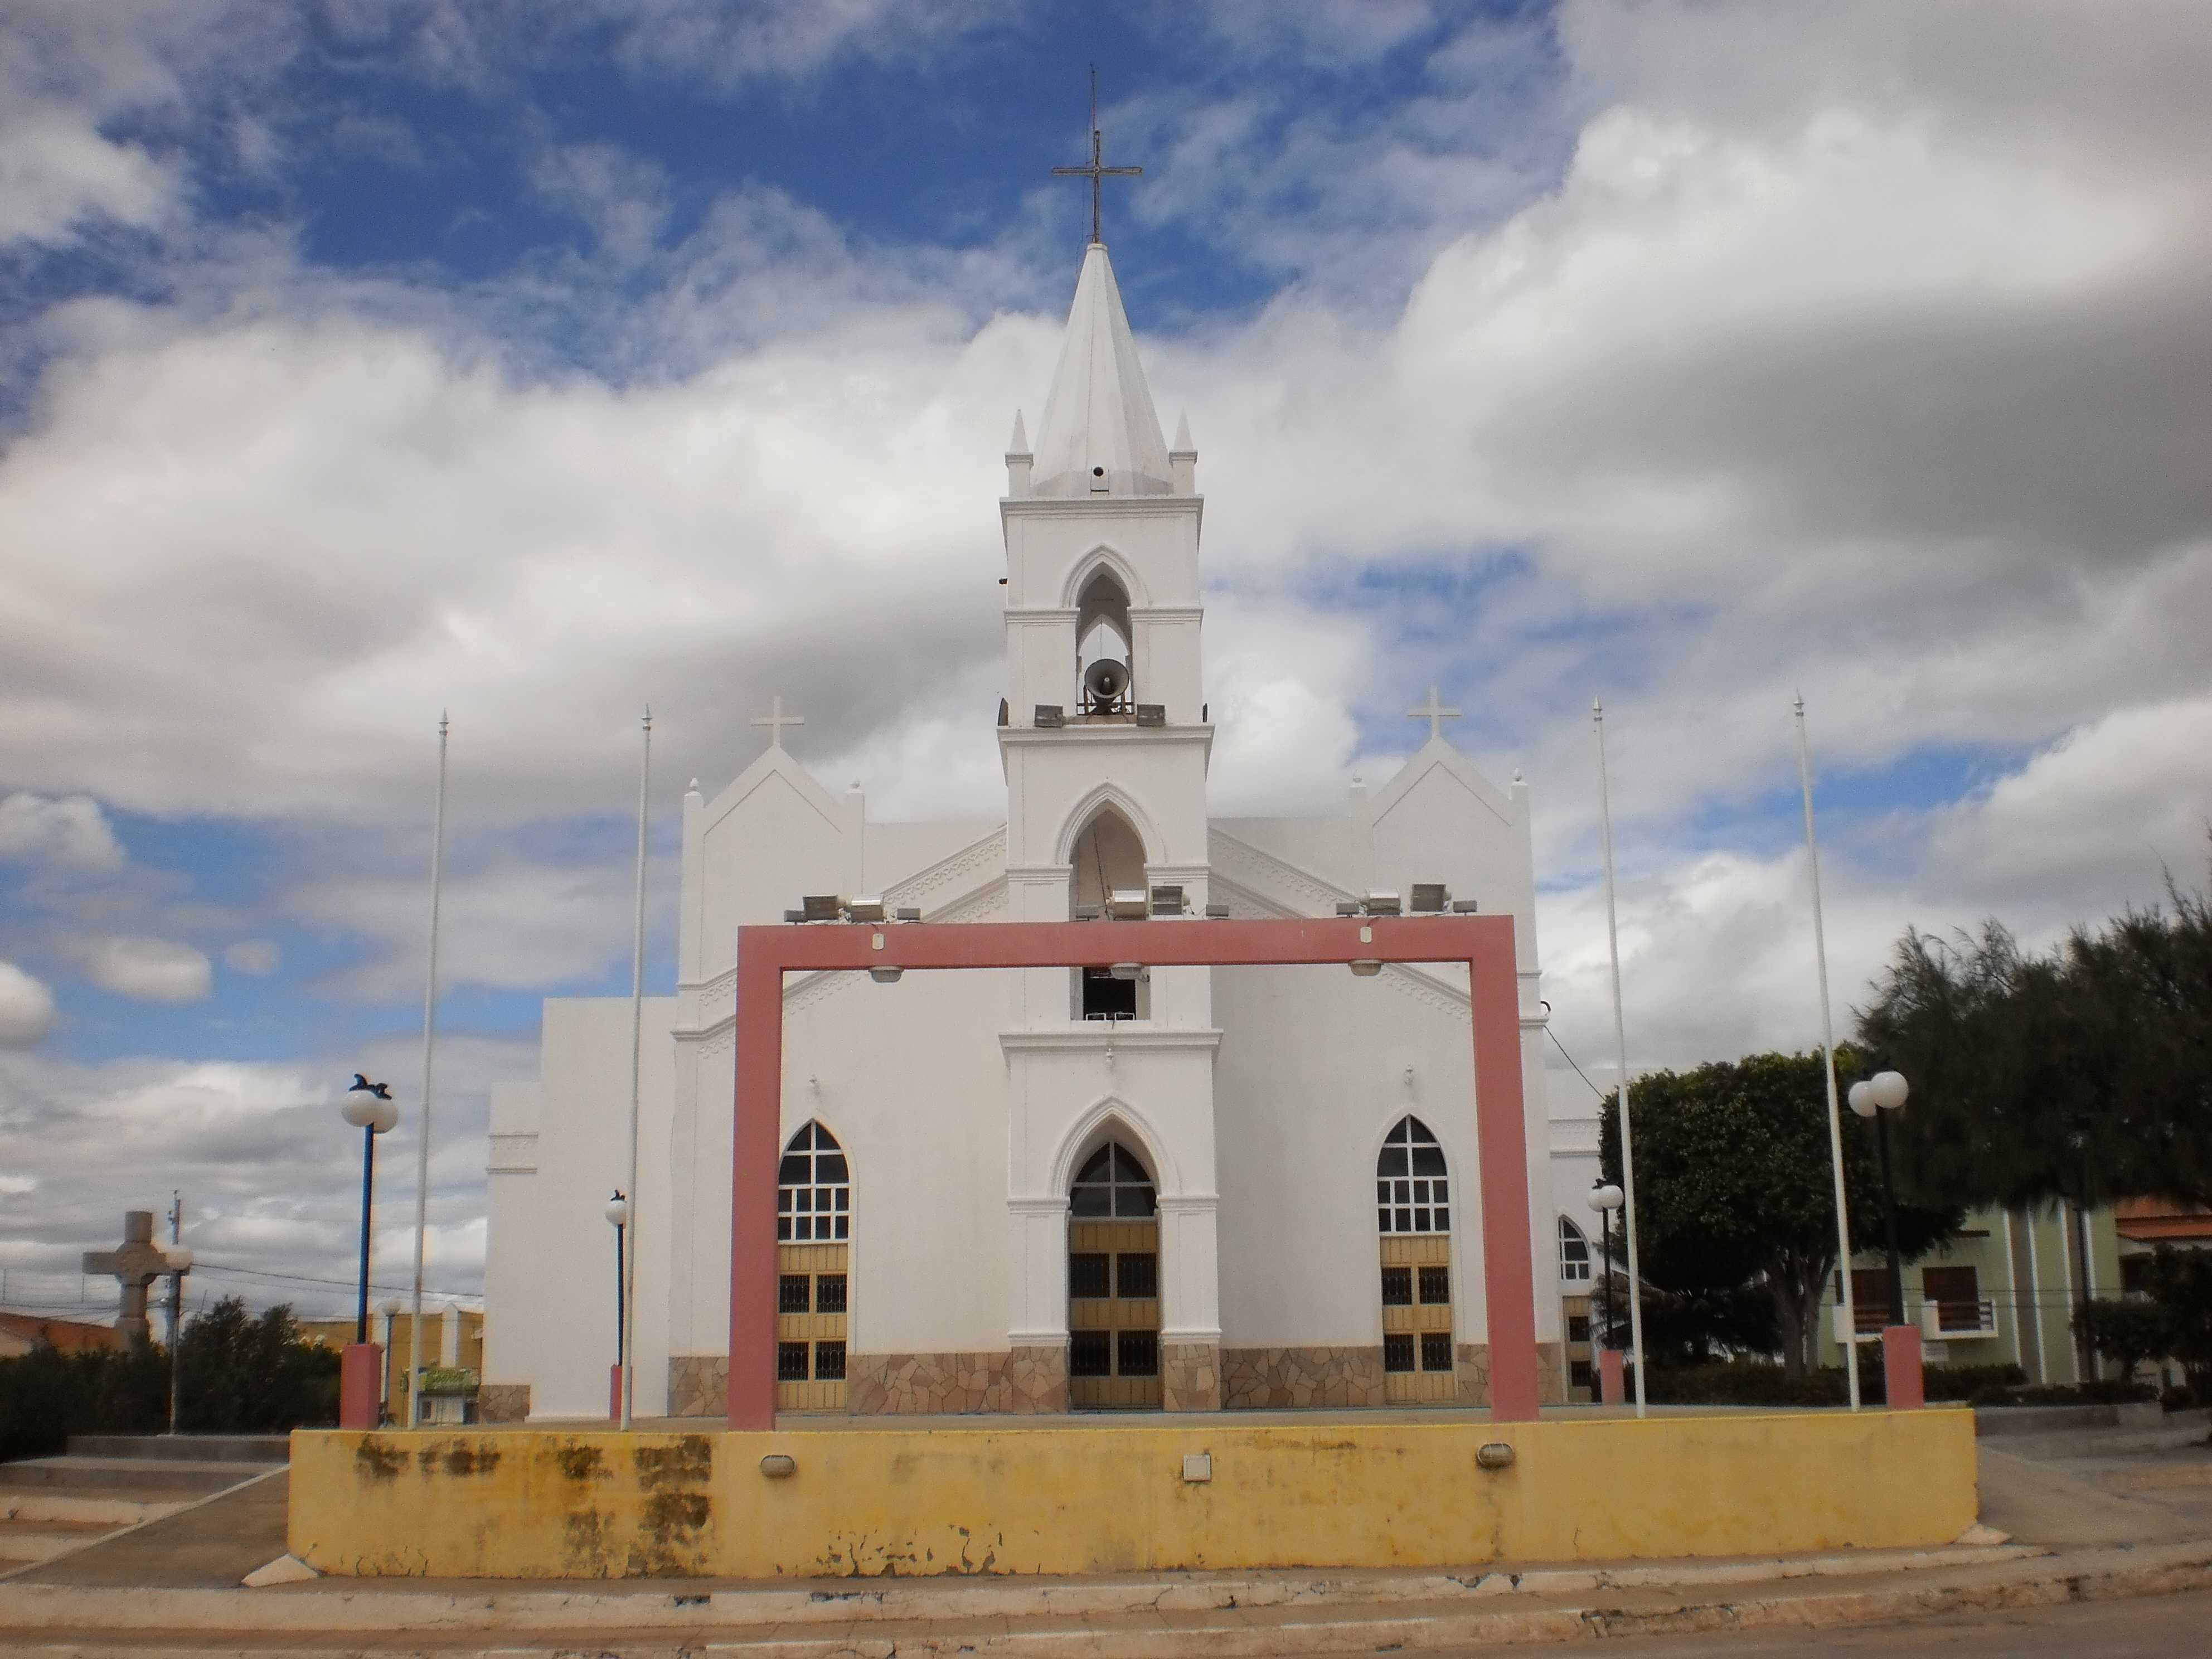 Umarizal Rio Grande do Norte fonte: upload.wikimedia.org